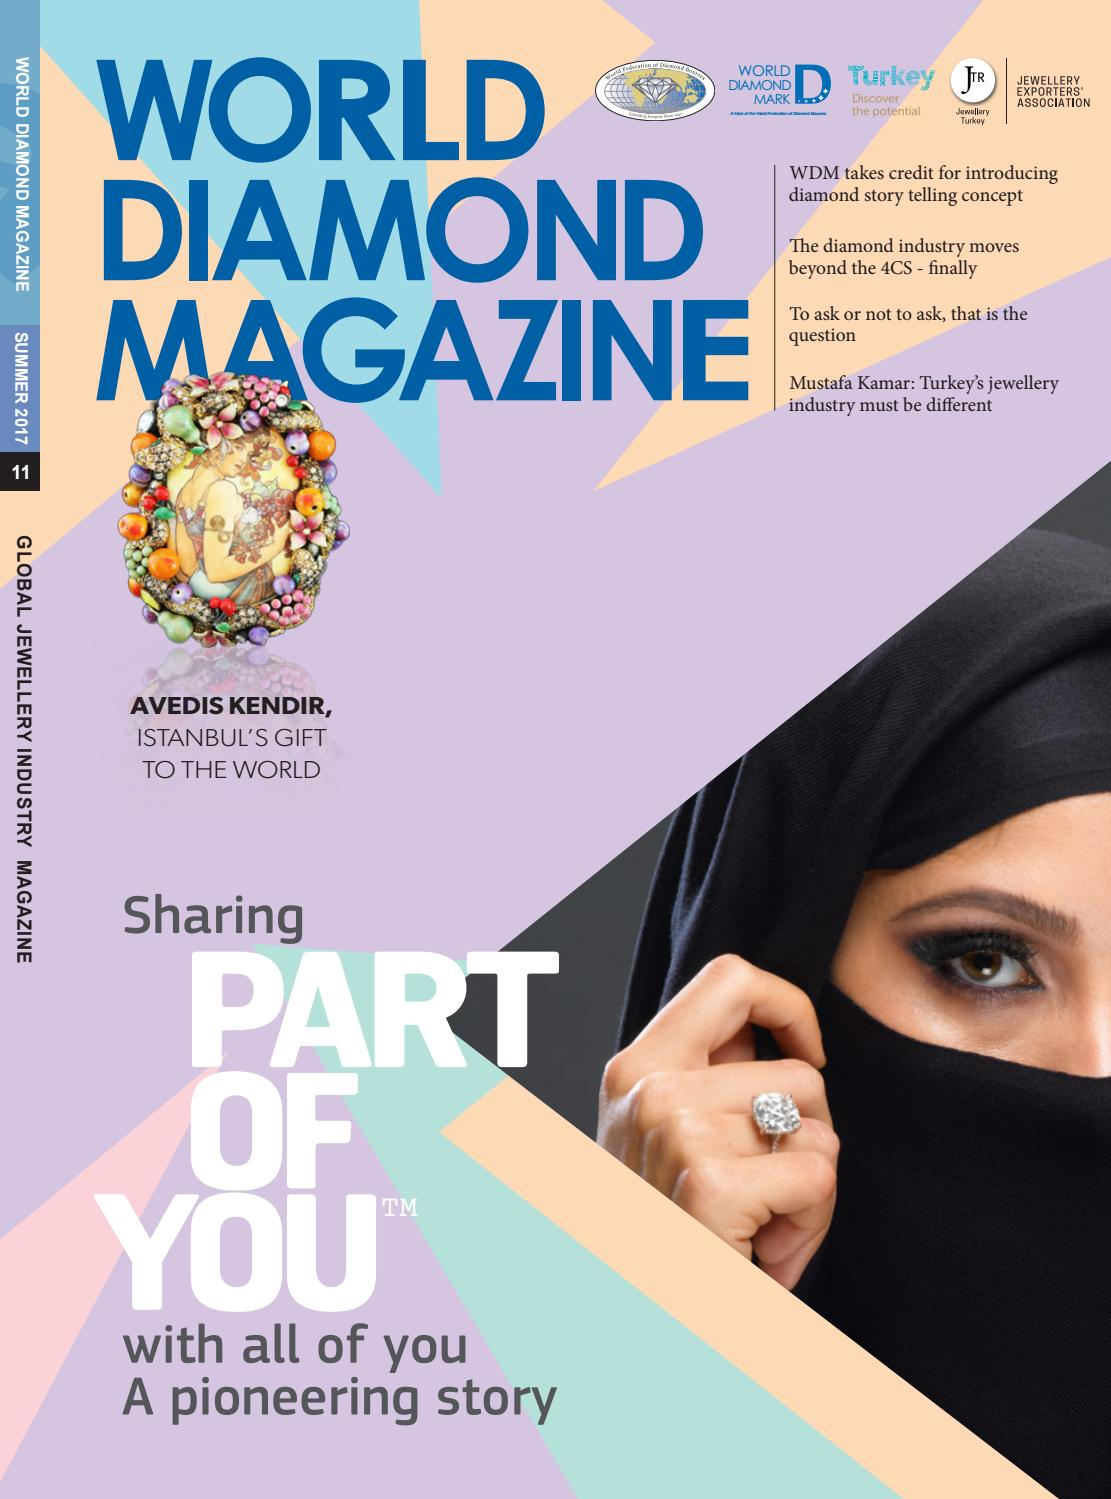 World Diamond Magazine 11 By Altin Dunyasi Yayin Grubu Issuu